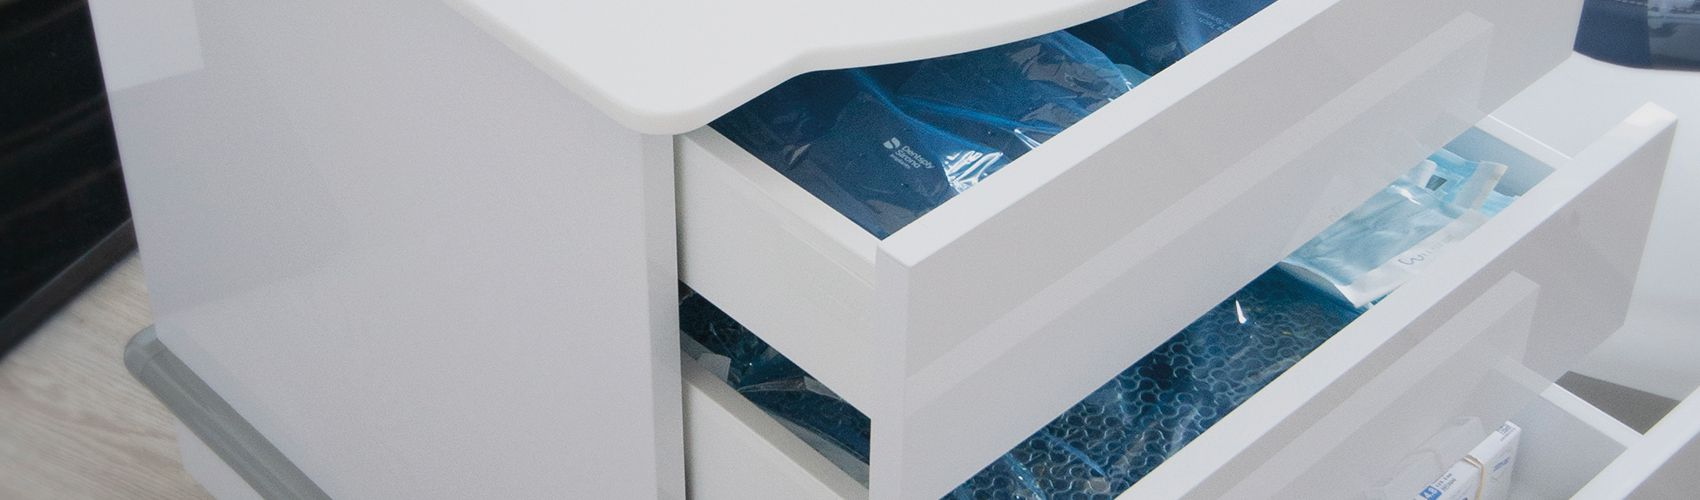 Decontamination Room Details